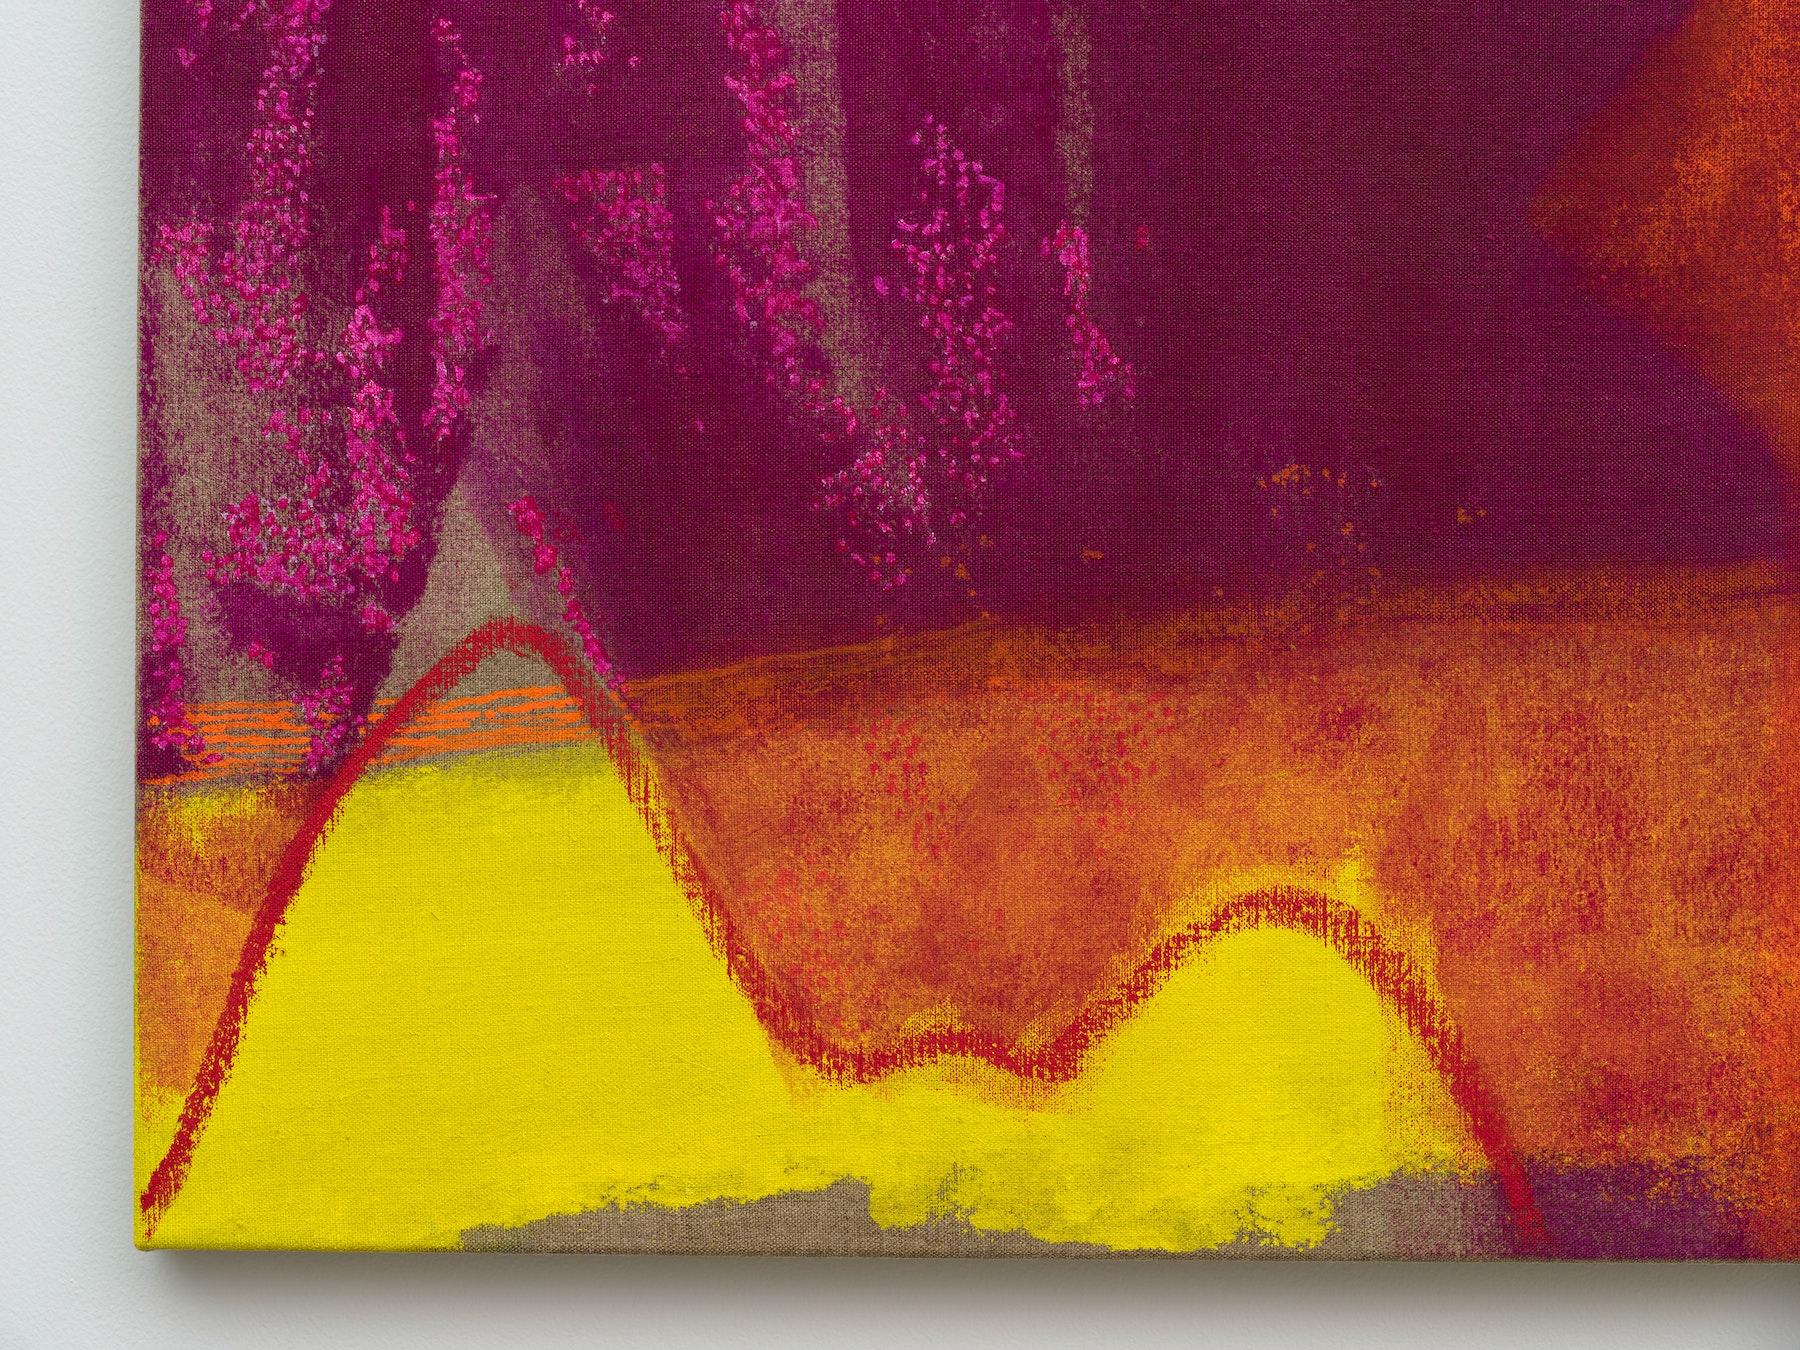 "Monique Van Genderen ""Snapshot 1,"" 2021 Oil on linen 48"" x 36"" [HxW] (121.92 x 91.44 cm) Inventory #VGE411 Courtesy of the artist and Vielmetter Los Angeles Photo credit: Jeff McLane"